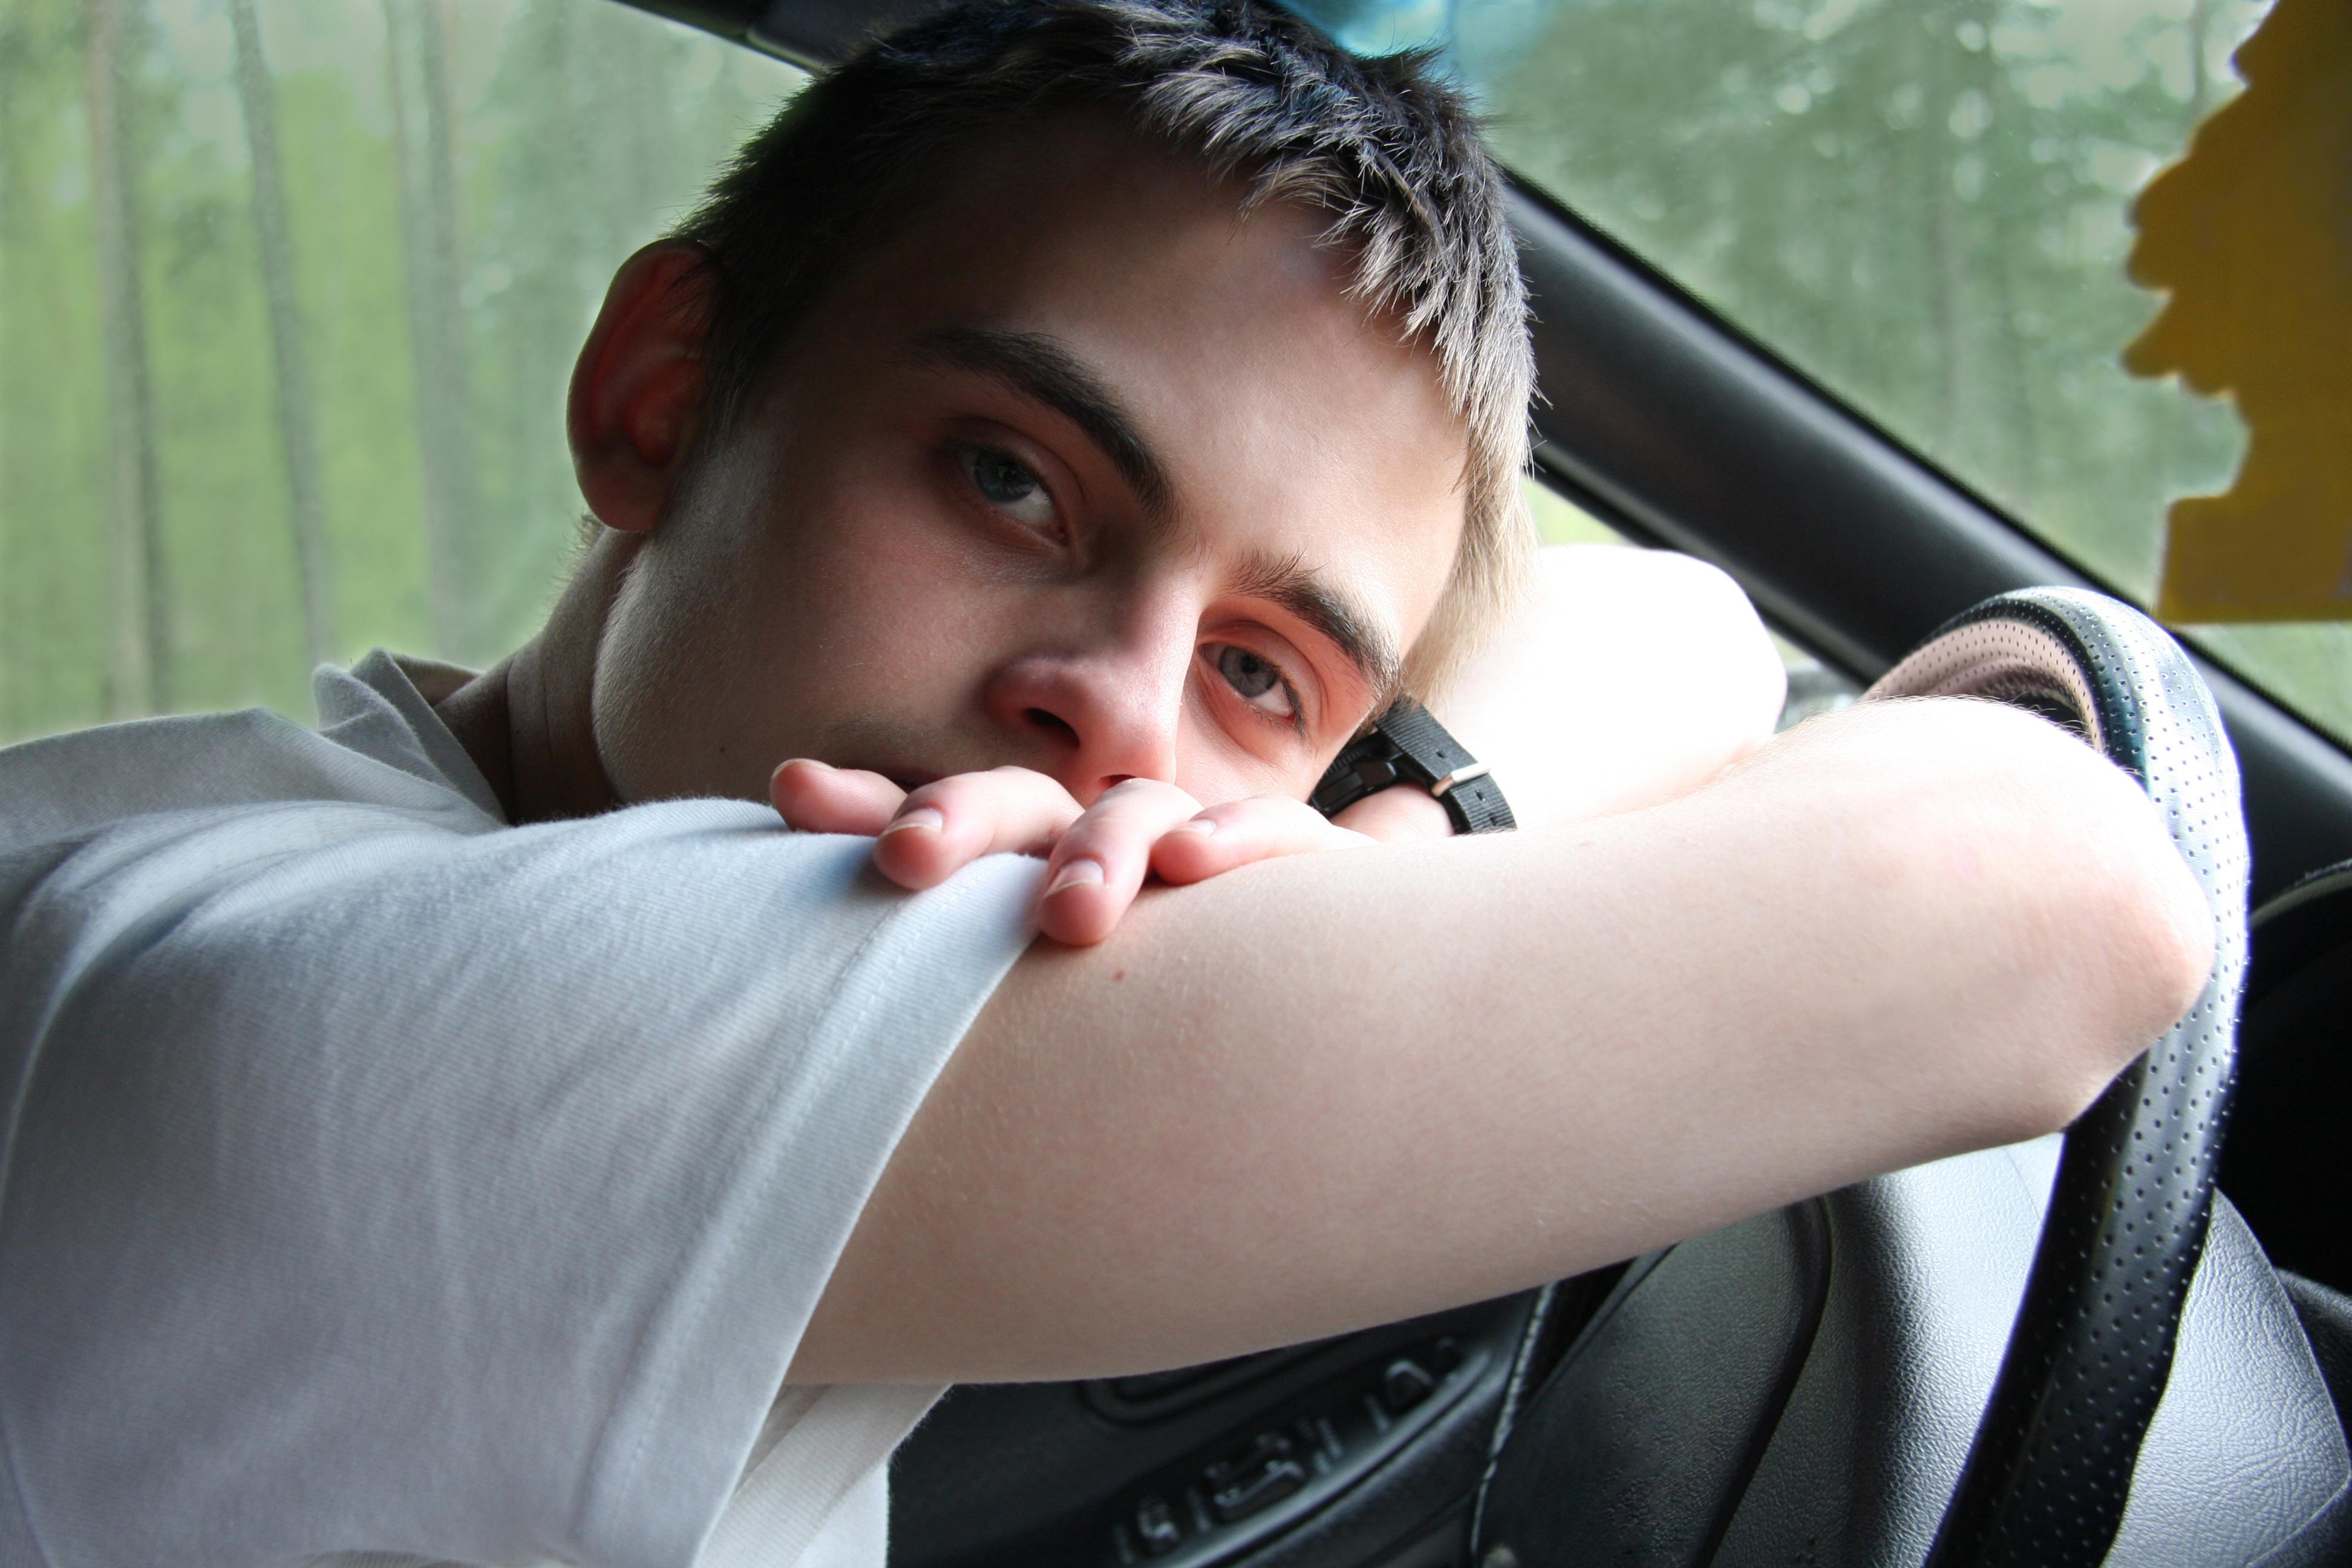 Teen Crash Rate 61